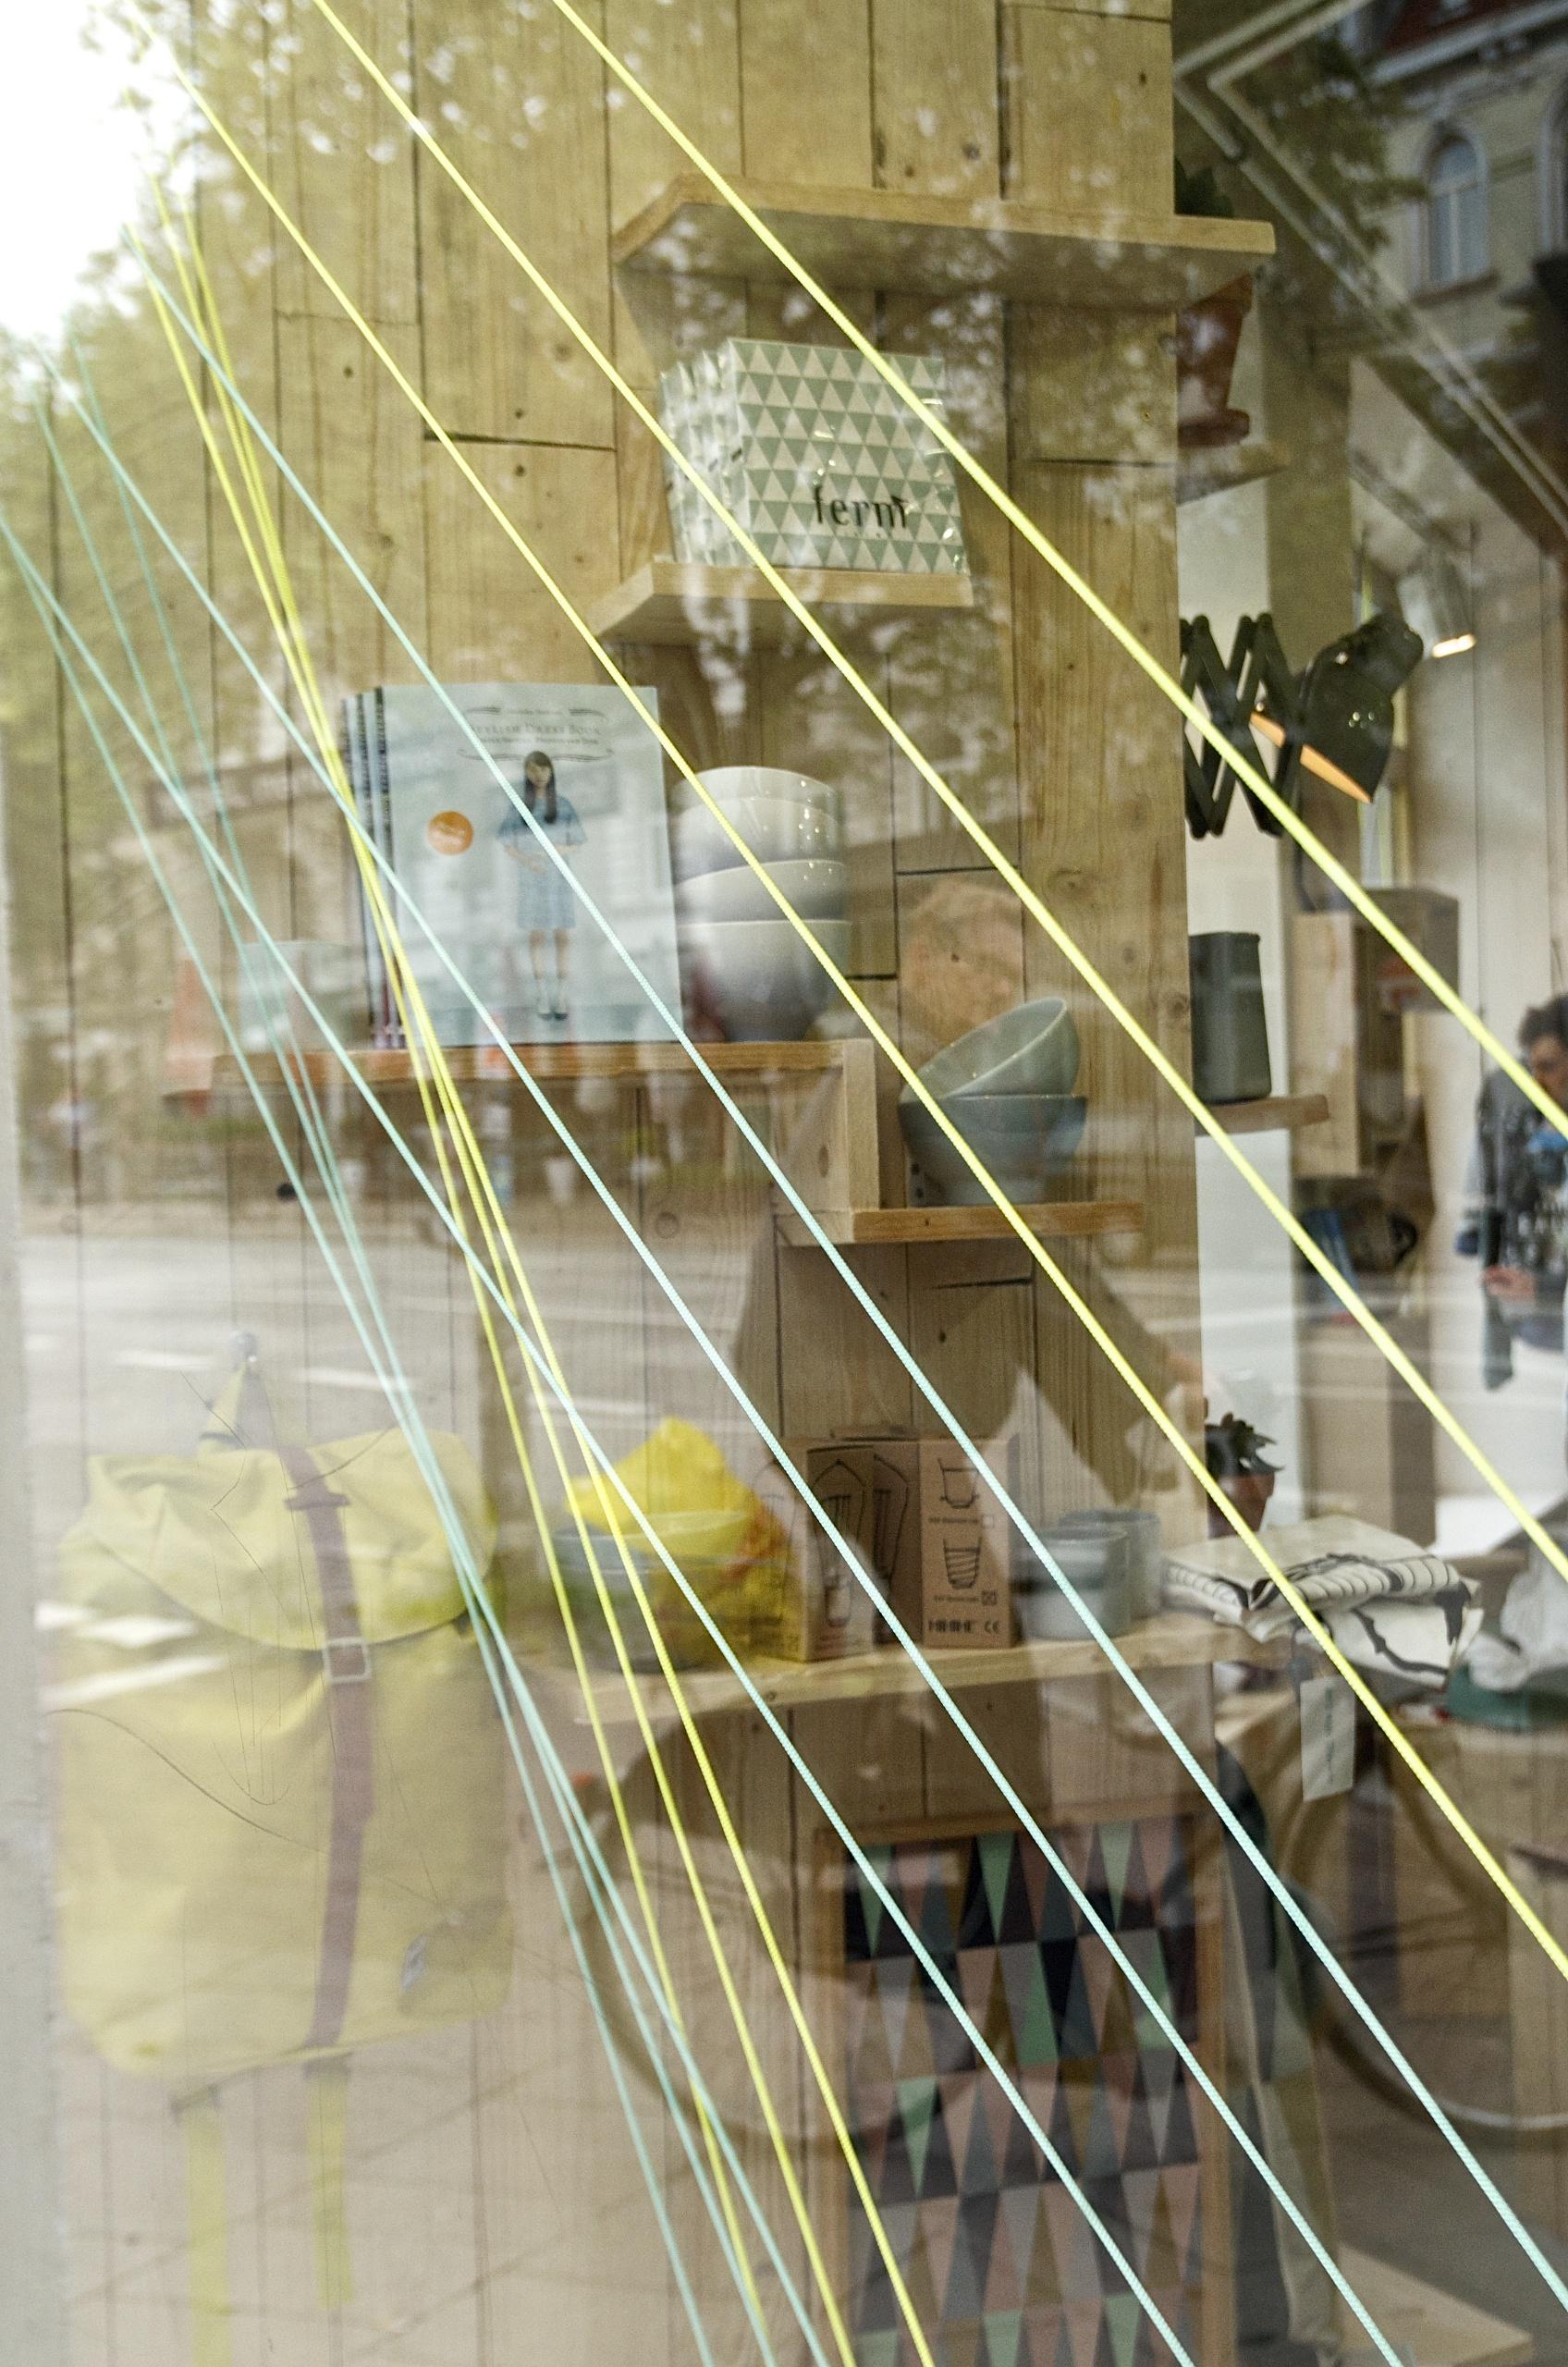 Schaufenster, Spiegelung, Ferm Living, Design